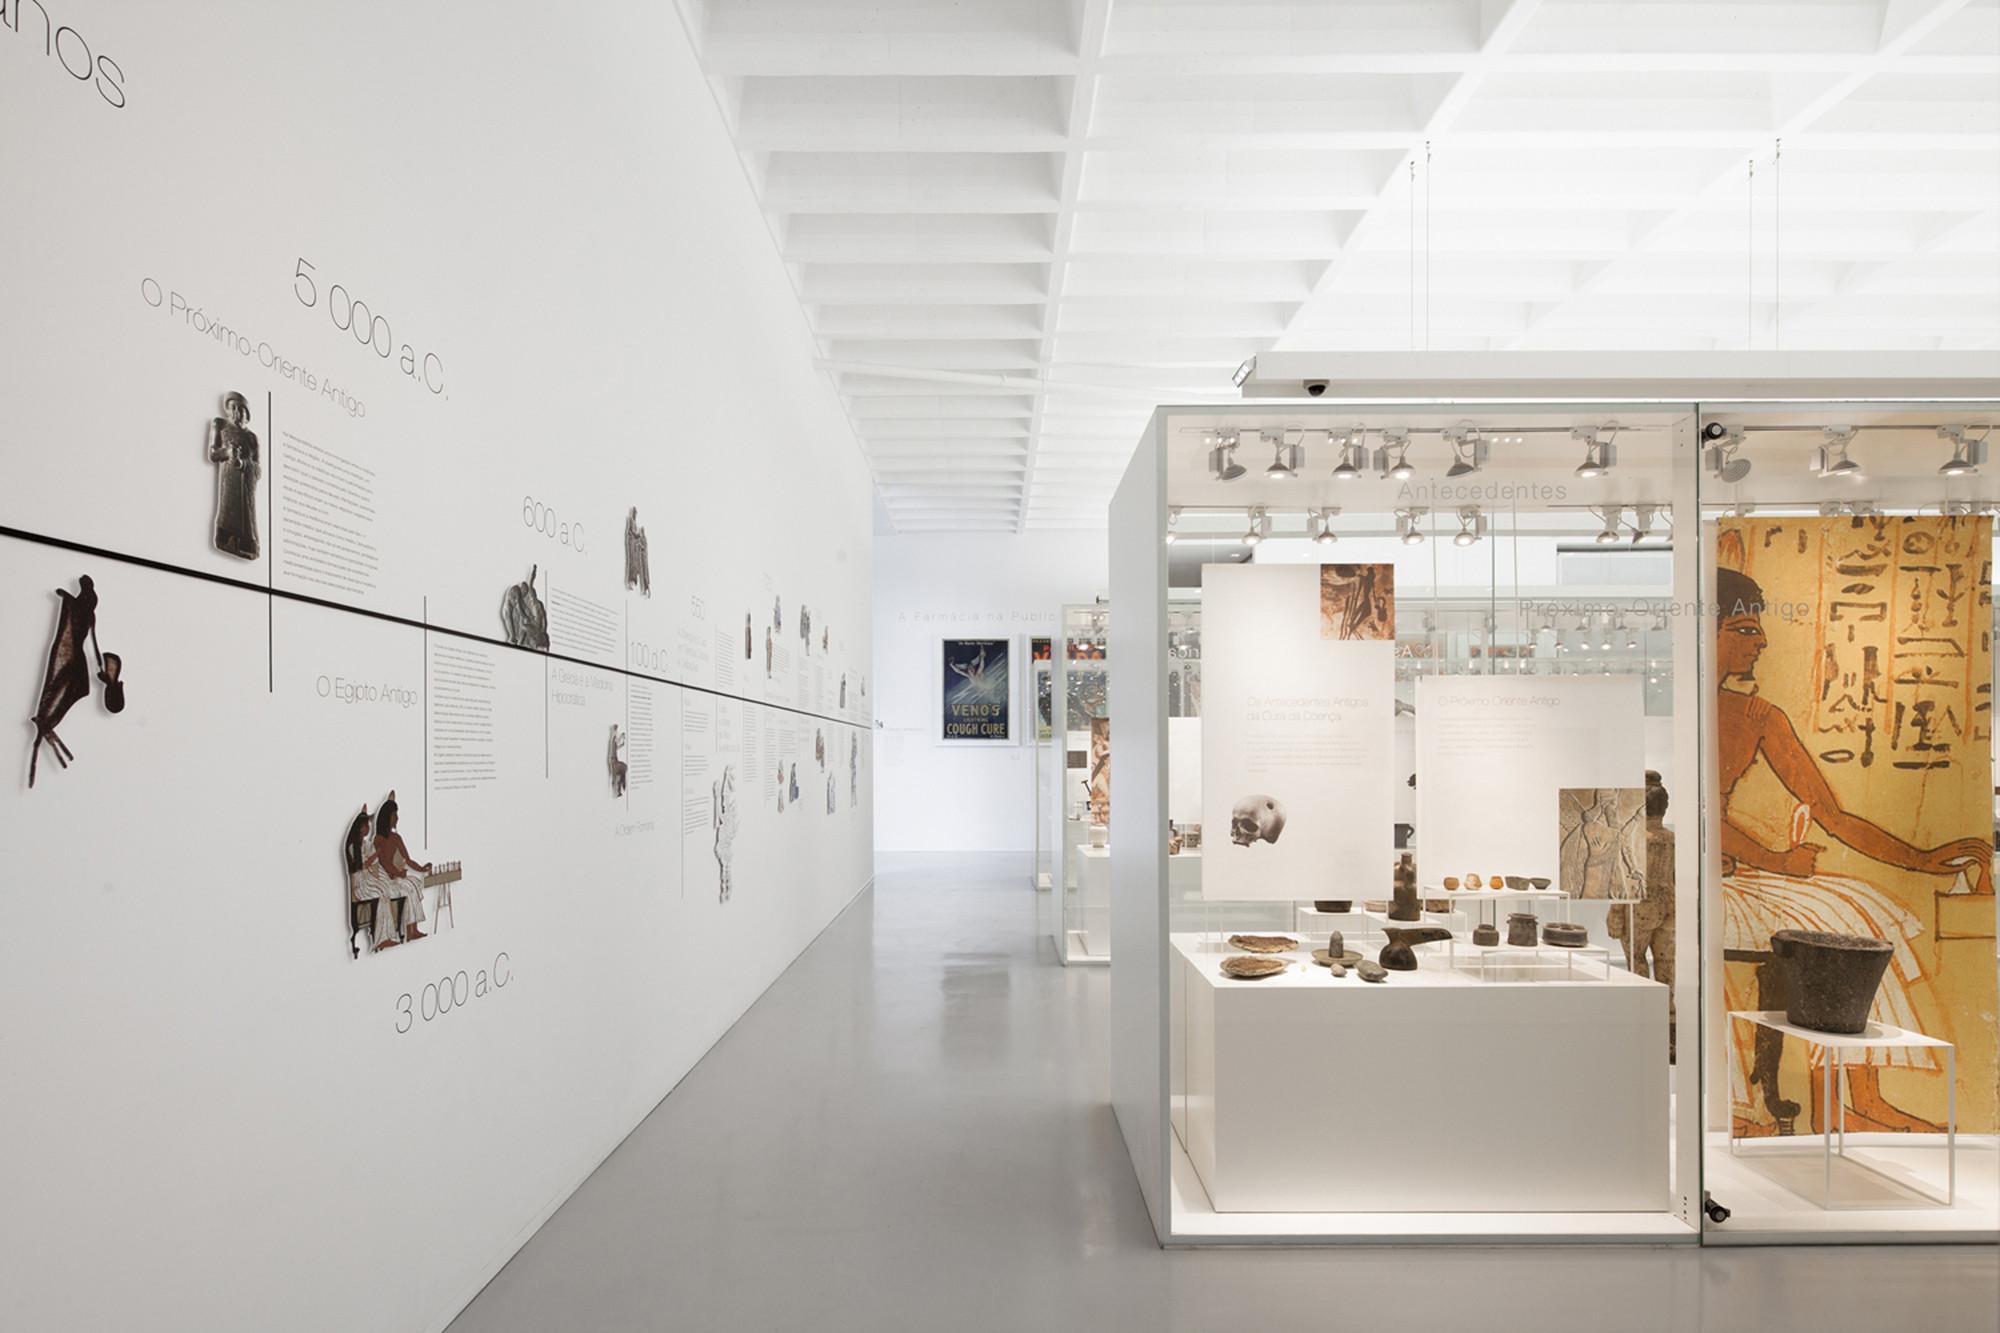 Pharmacy Museum / Site Specific Arquitectura, © João Morgado